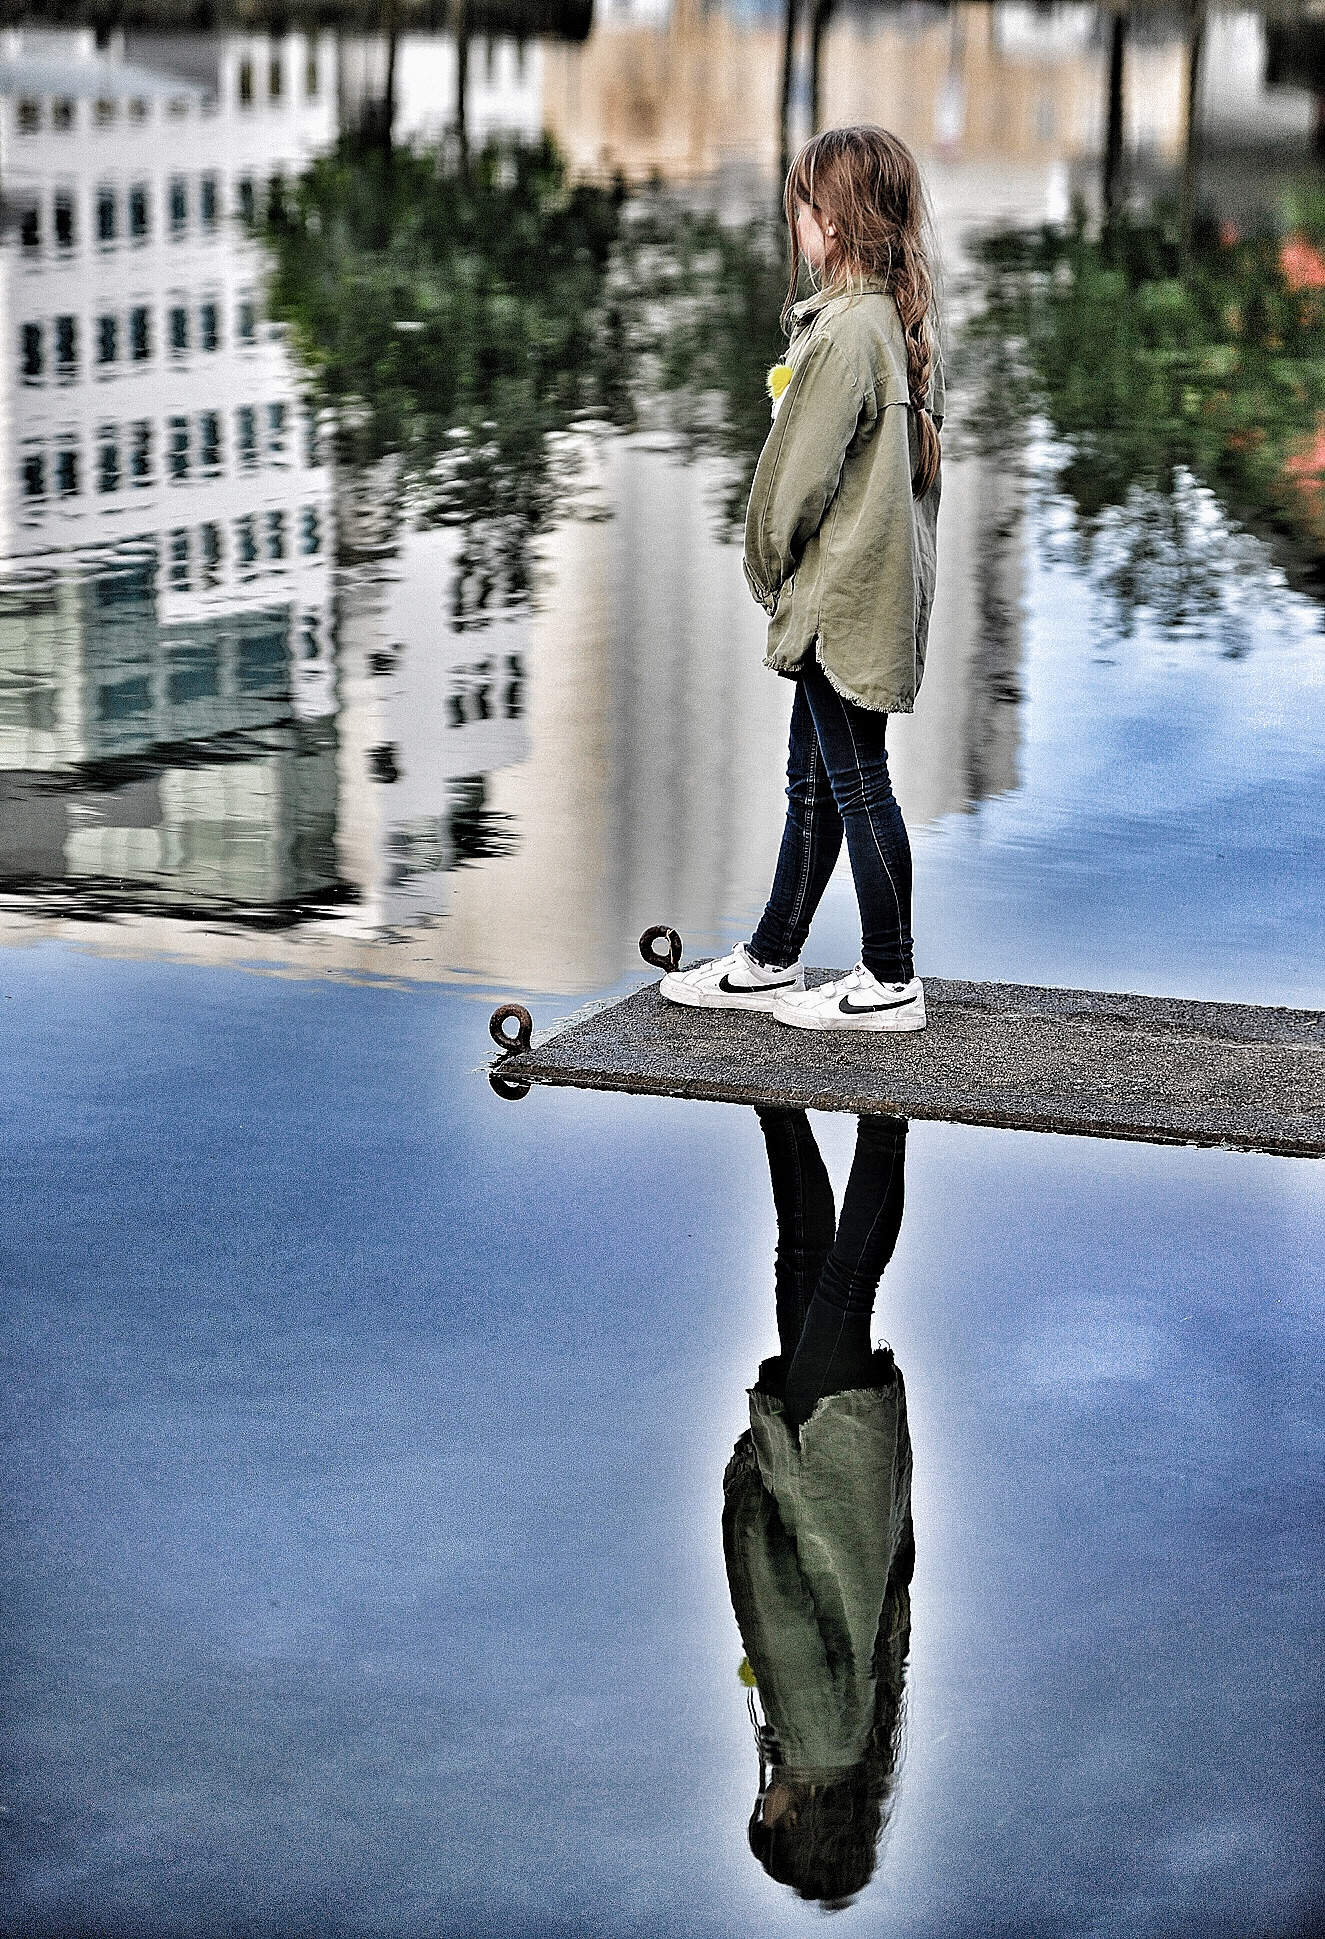 outdoor photography - urban style - fotografkallen.com